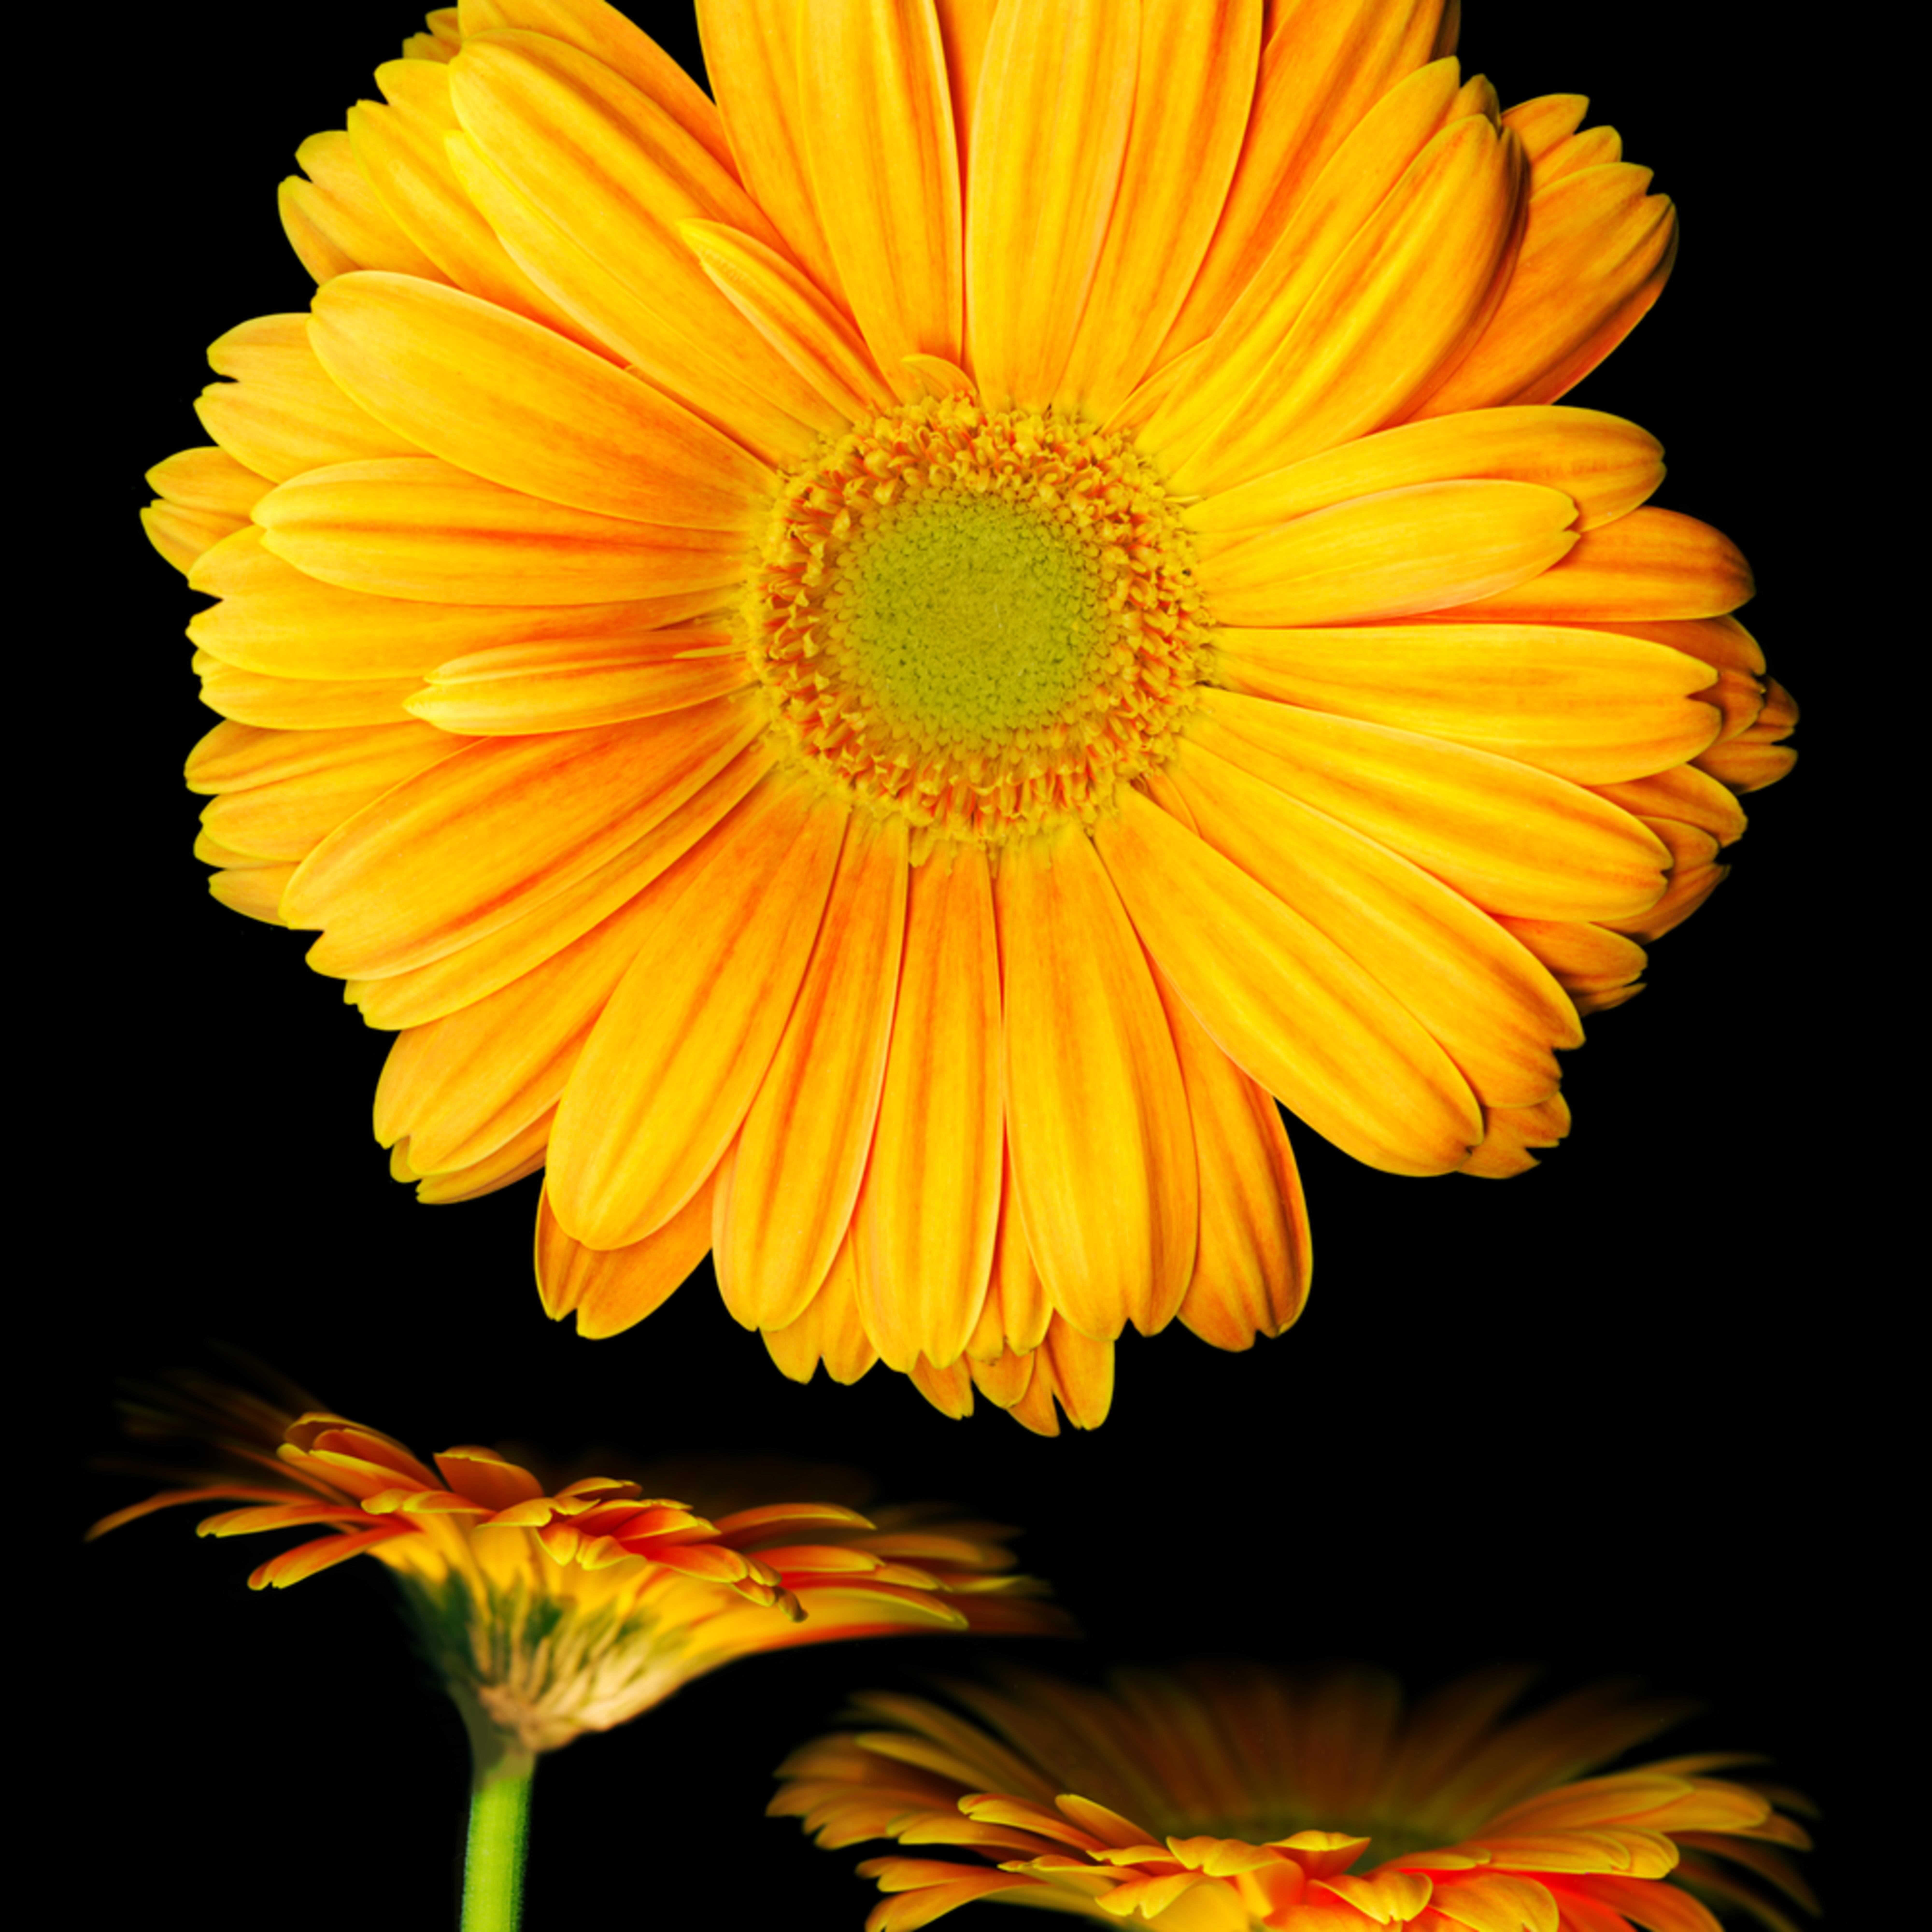 060504 ahern orange gerbera daisies 30x40x300 vbixtw